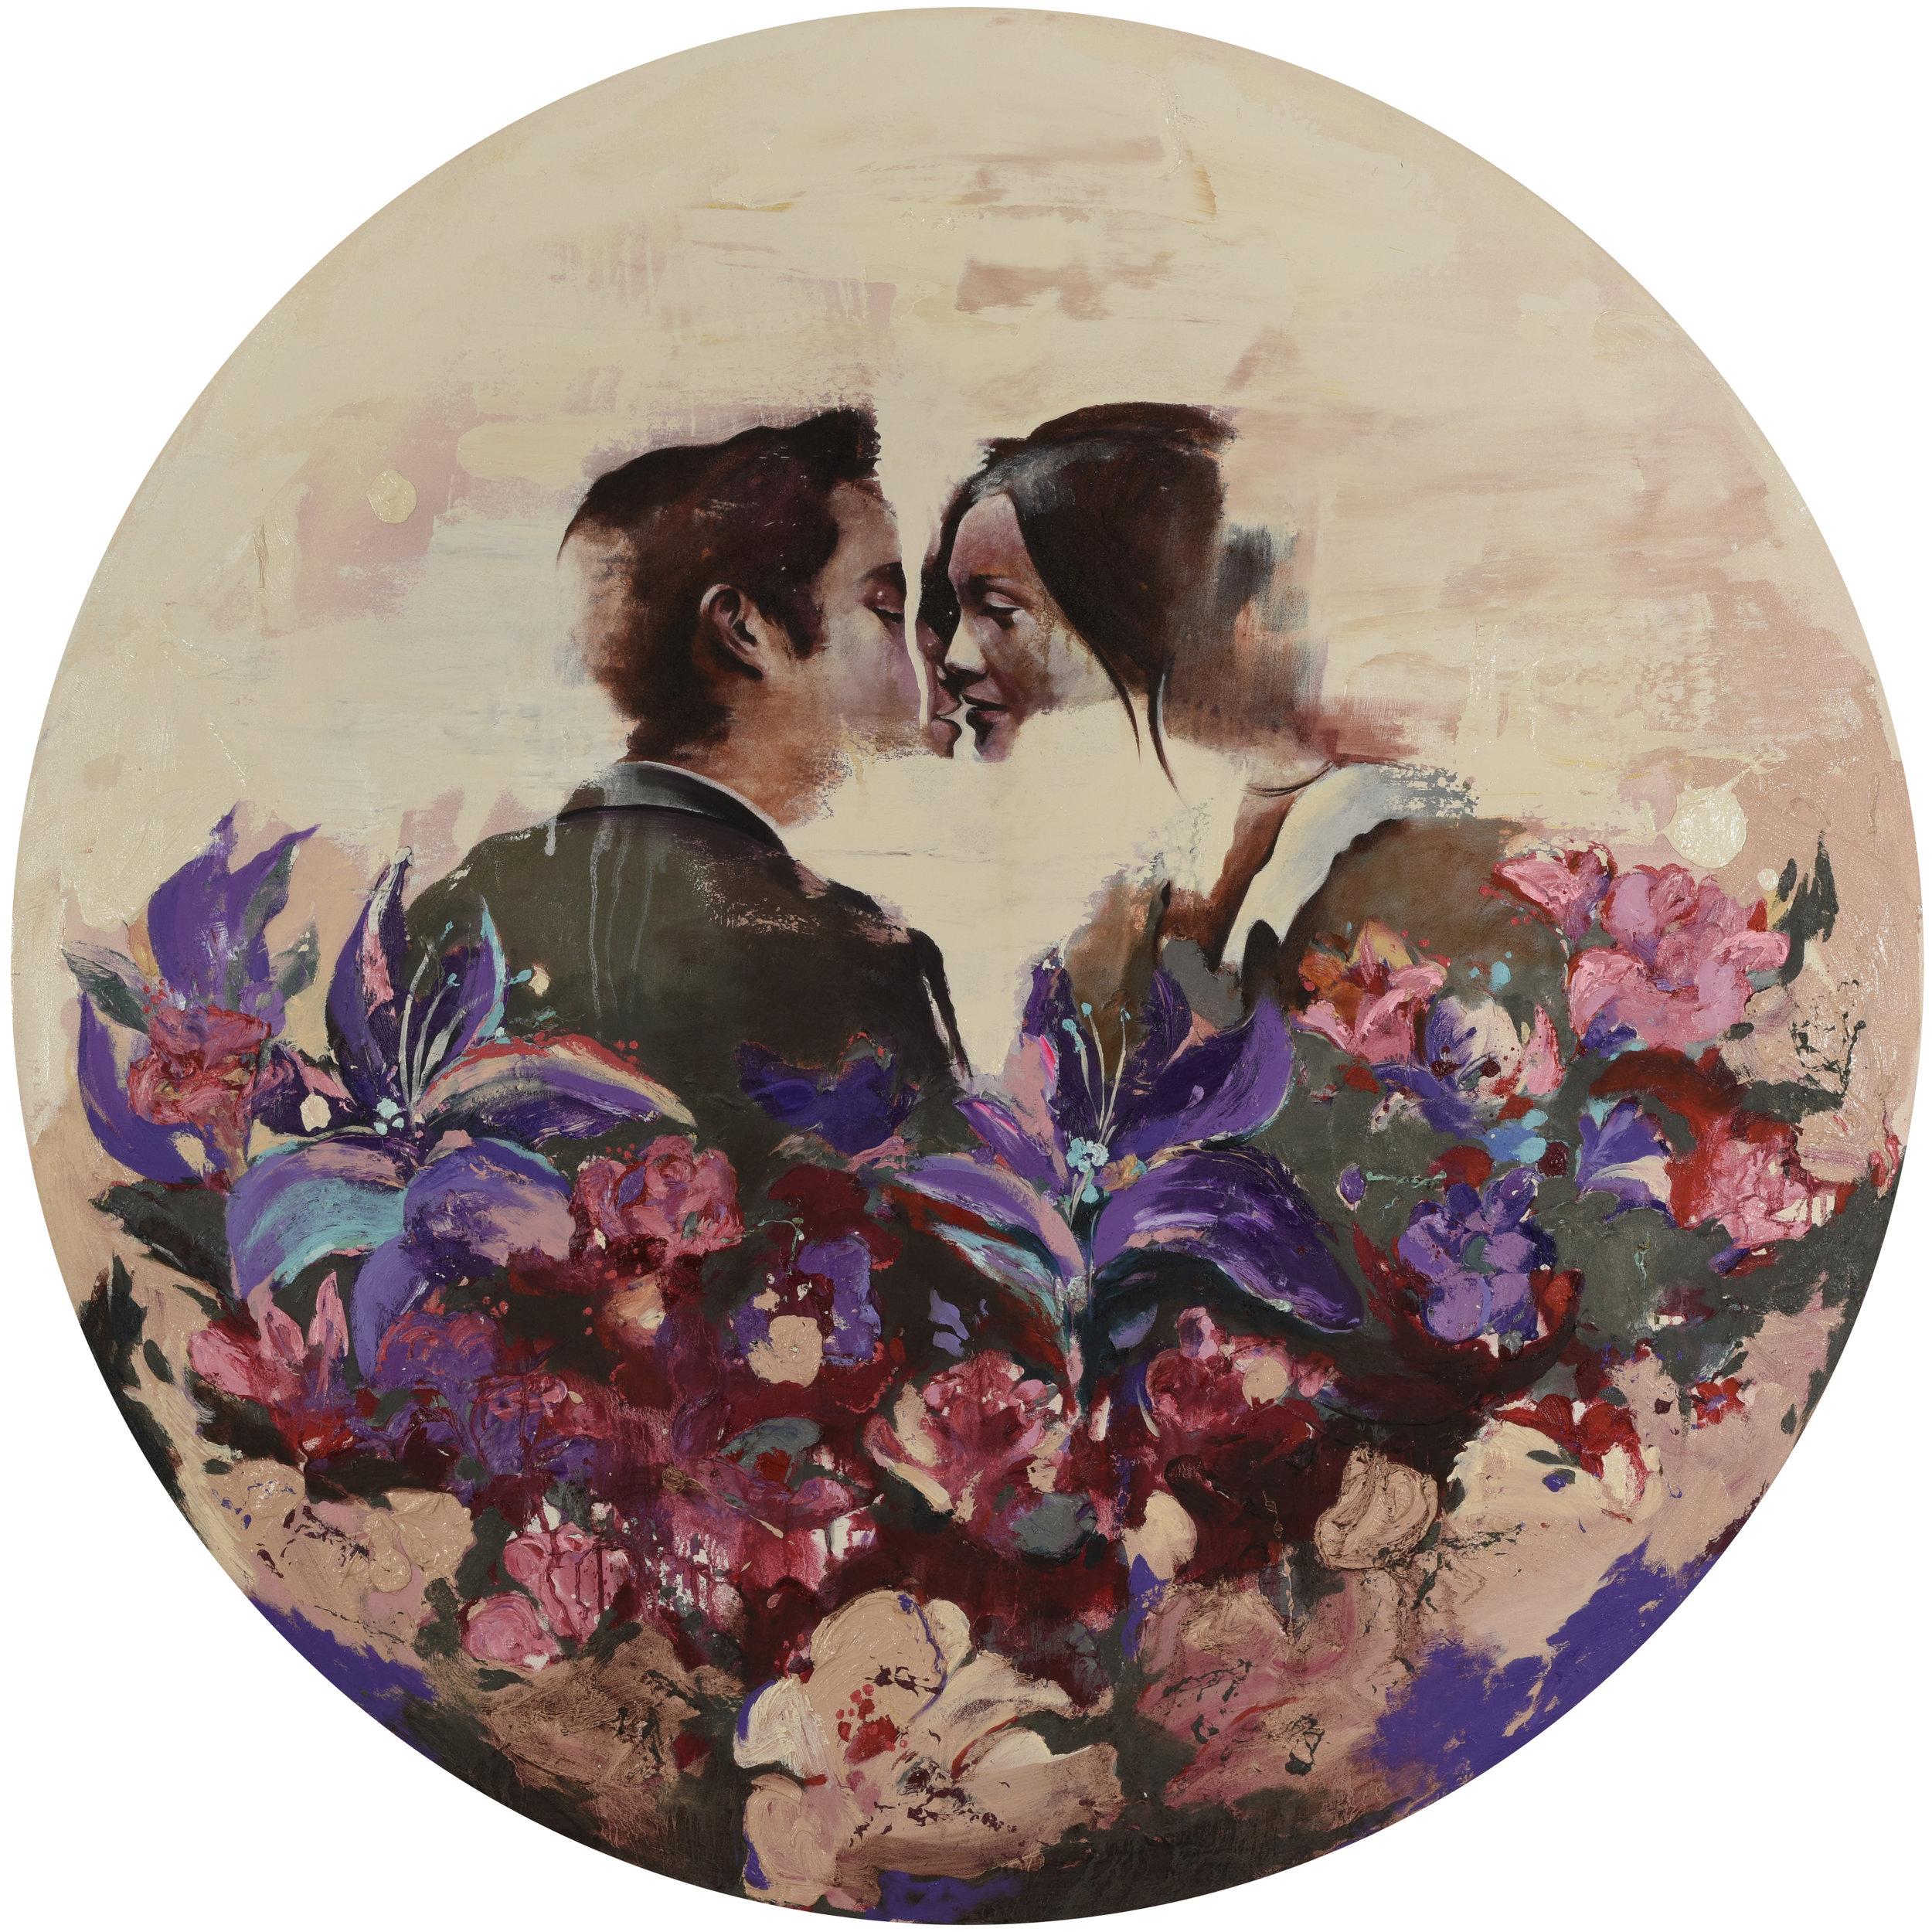 Flower Box 1 - Oil on canvasD: 156 cm